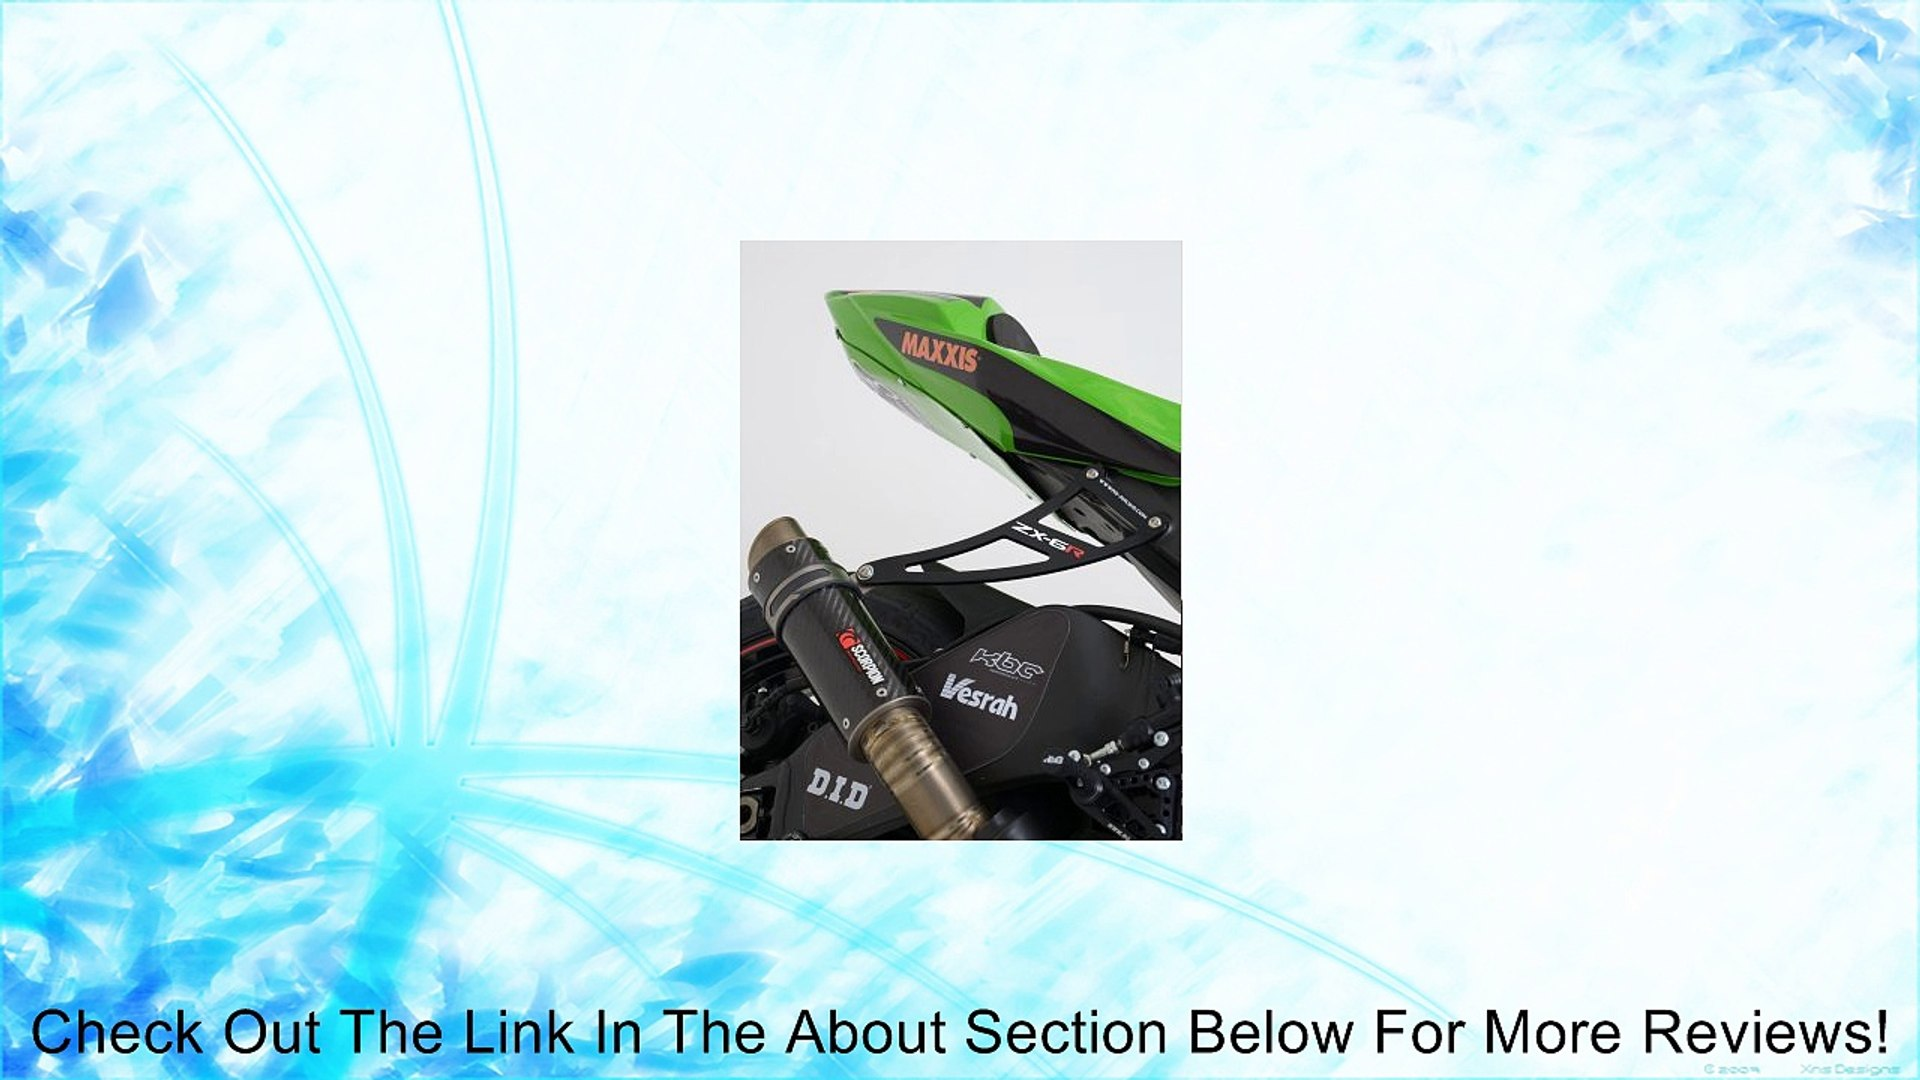 R/&G Racing Header Downpipe Grill Guard for Kawasaki ZX-6R 2013-2014 DG0013BK